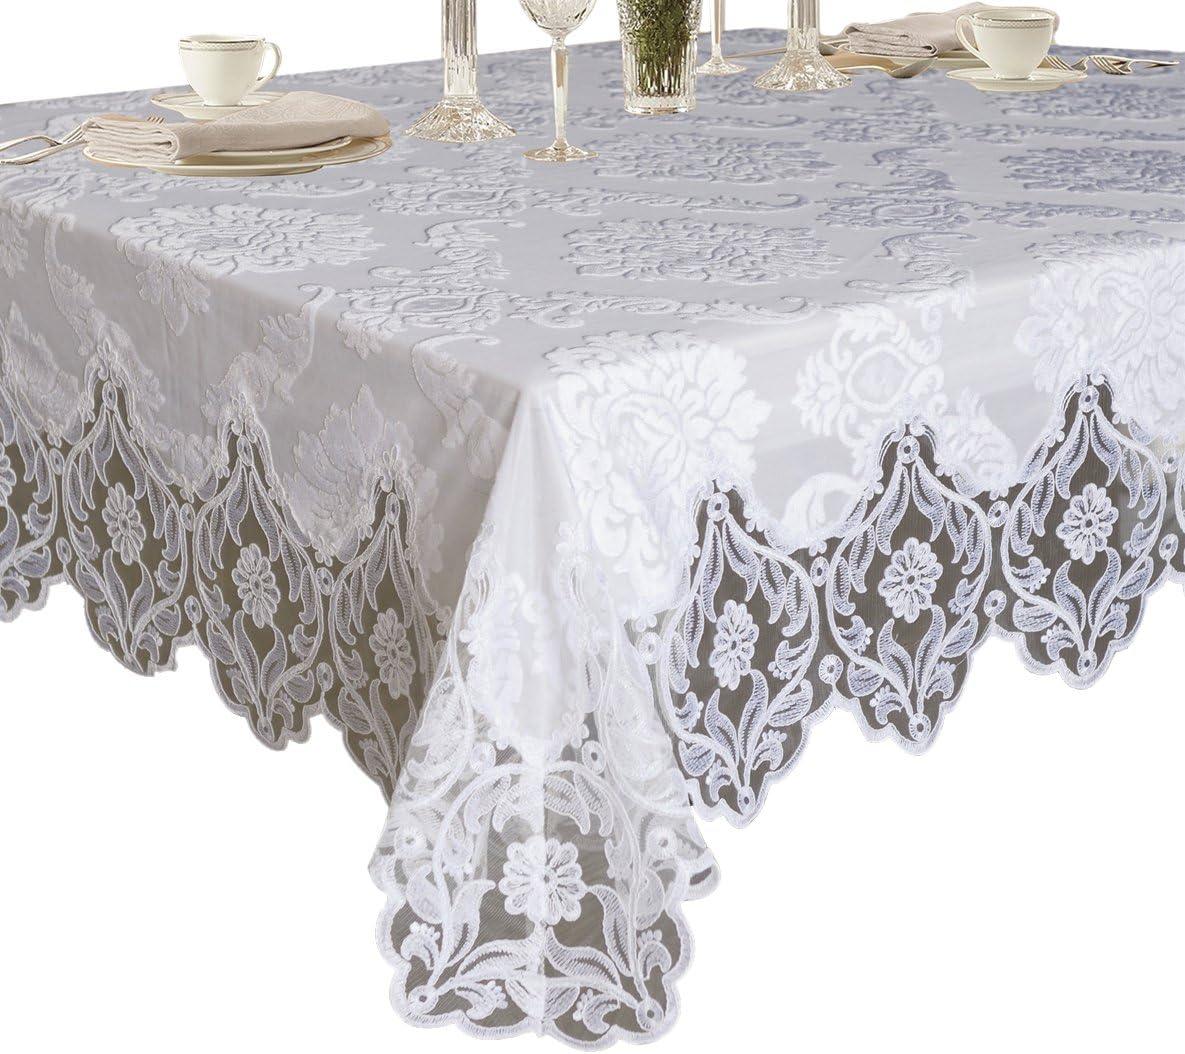 Omaha Mall Violet Linen Elegant Velvet Lace Deluxe Tabl Sheer Over item handling Floral Design